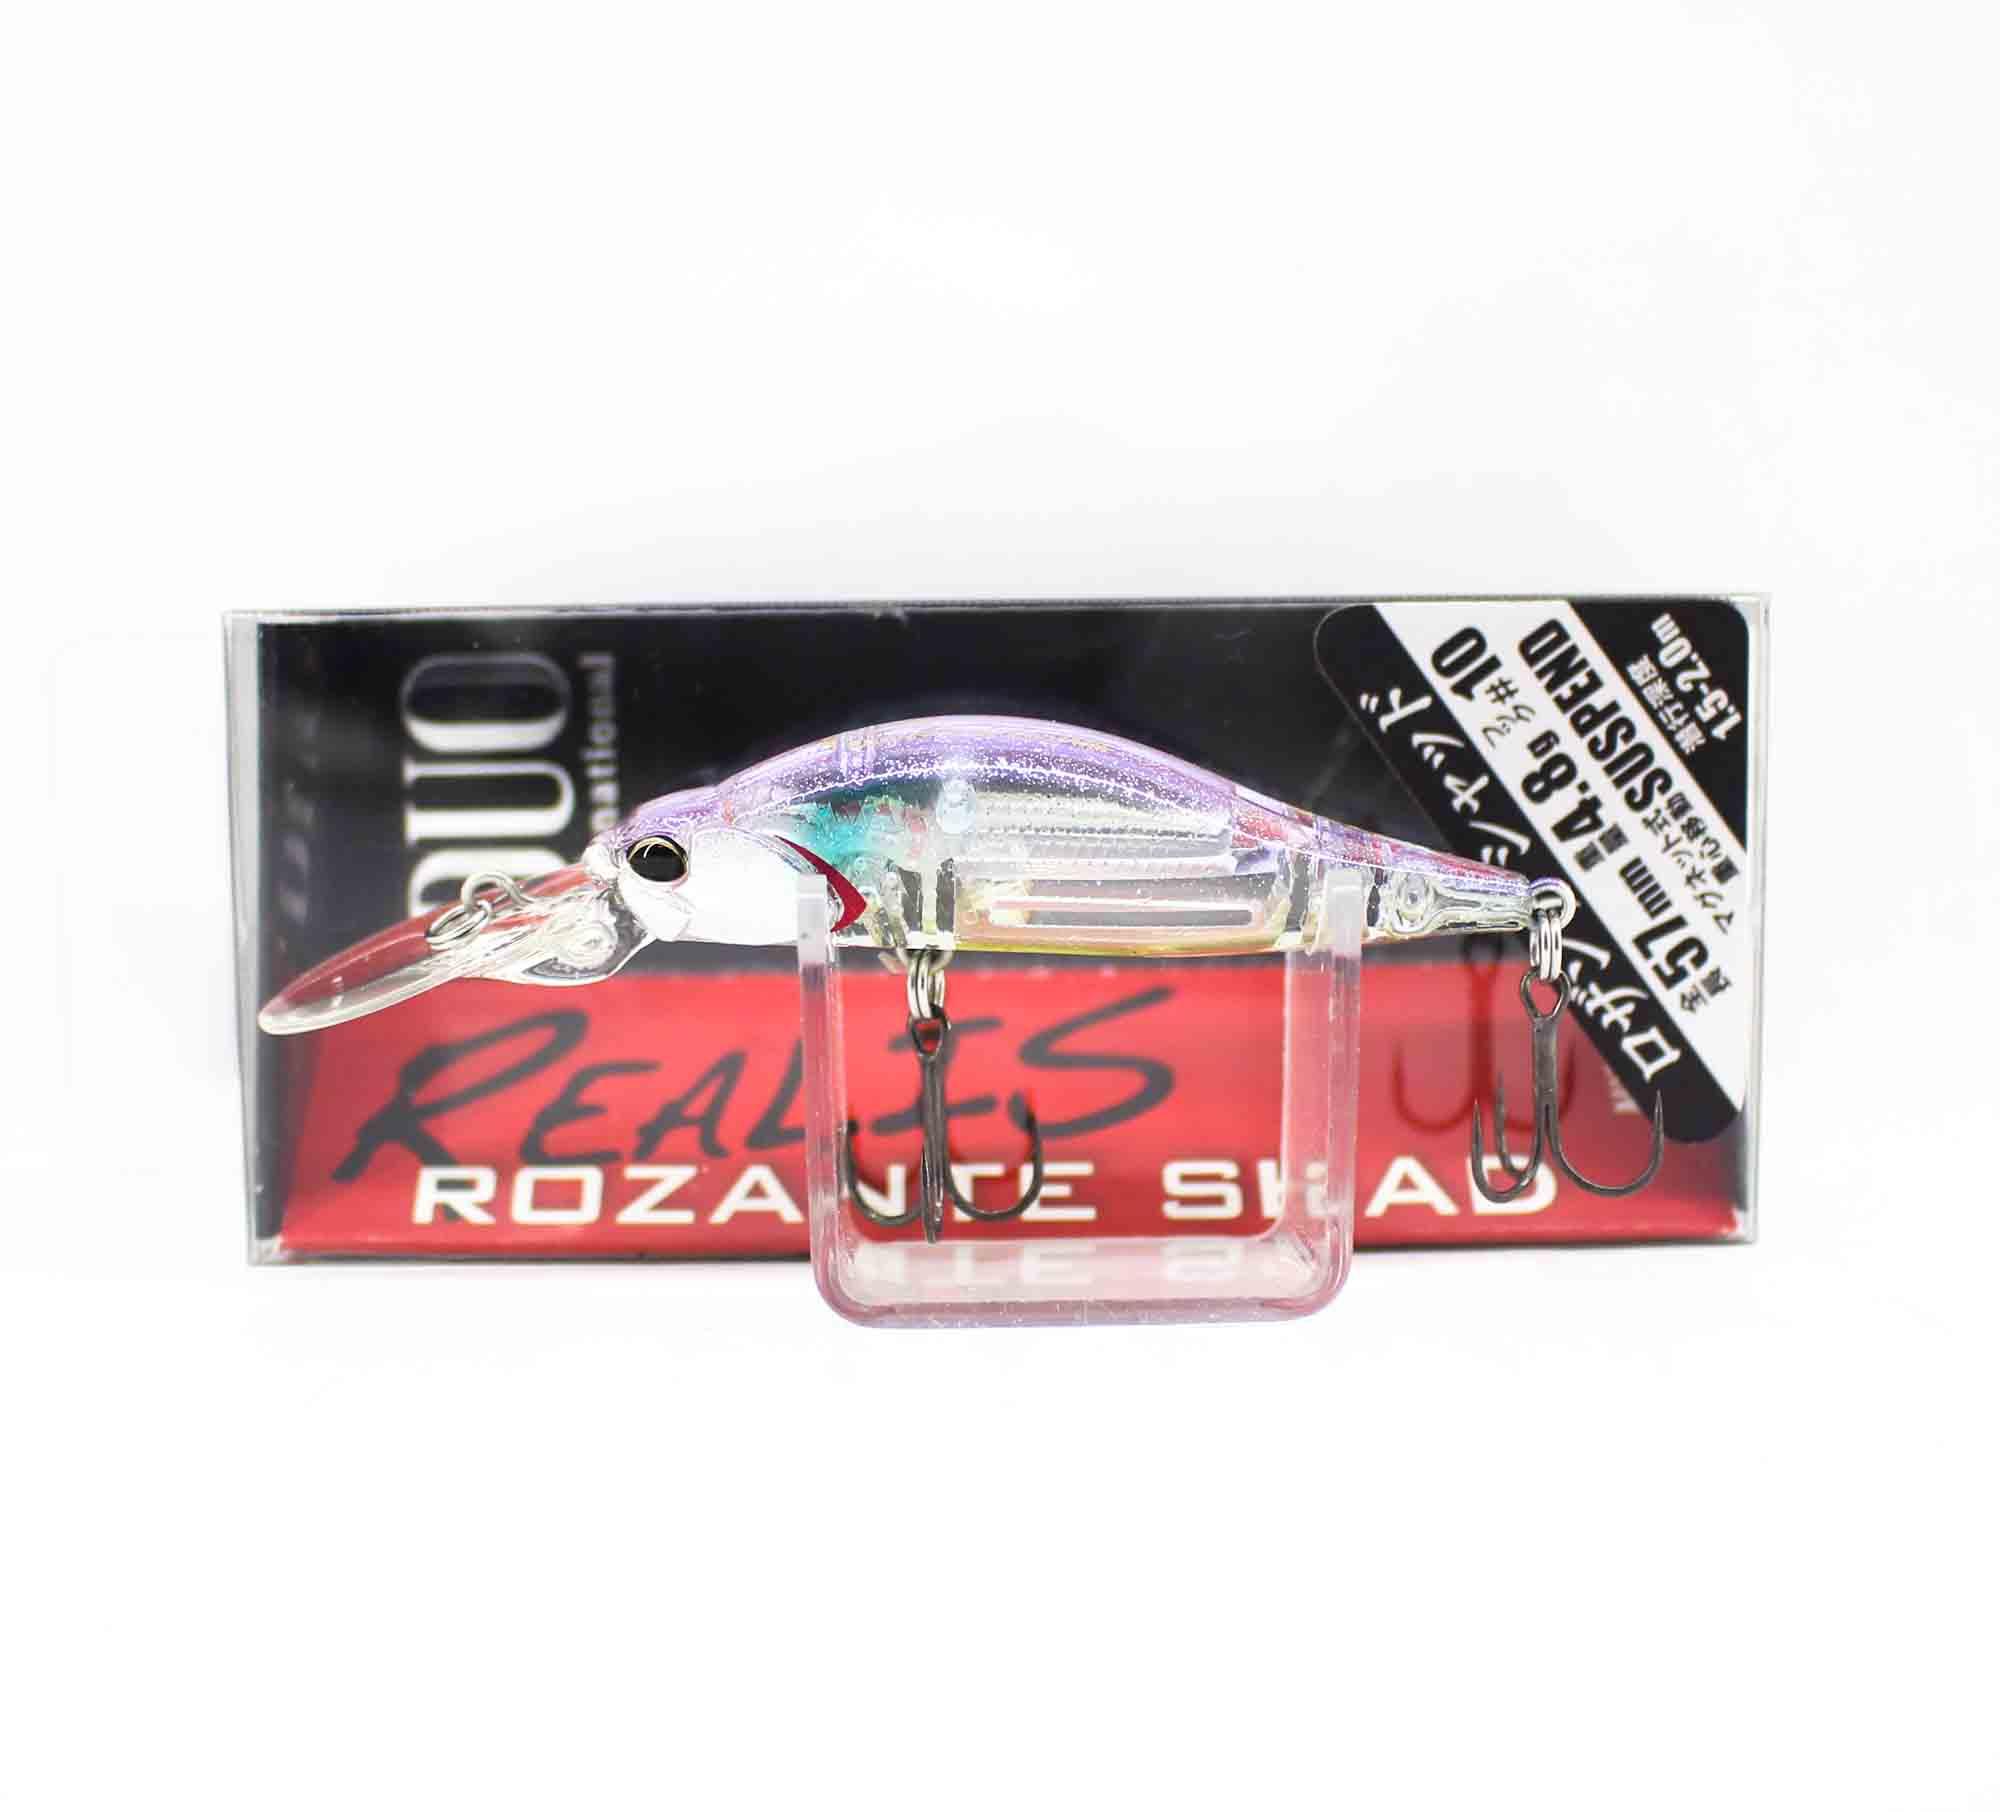 Duo Realis Rozante Shad 57 MR Suspend Lure CCC3373 (9673)